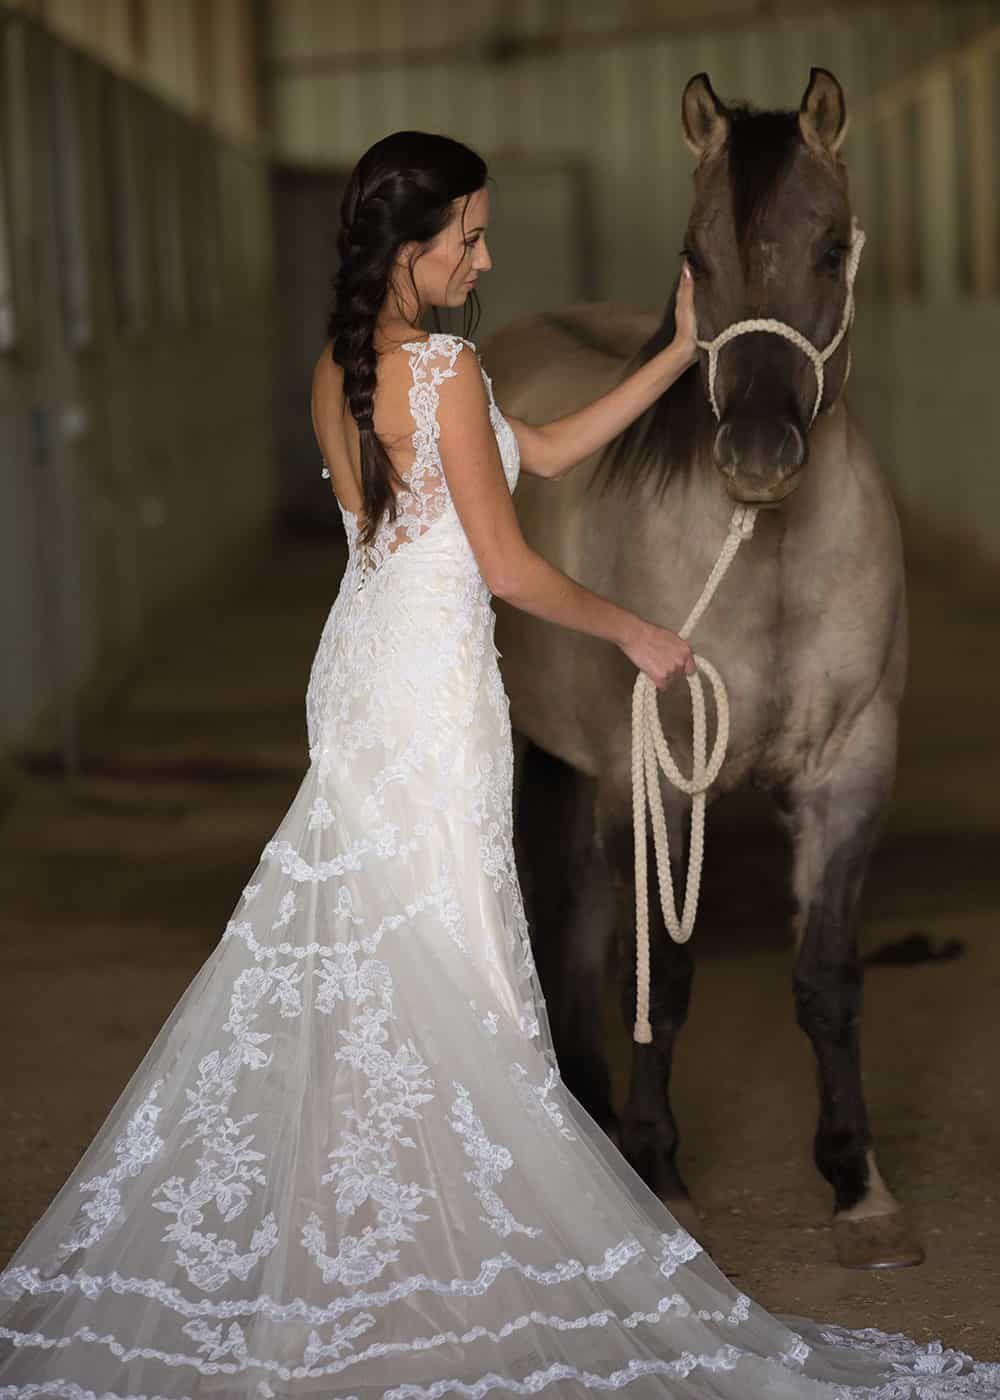 horse and bride wedding poses dunlap photography cowgirl magazine